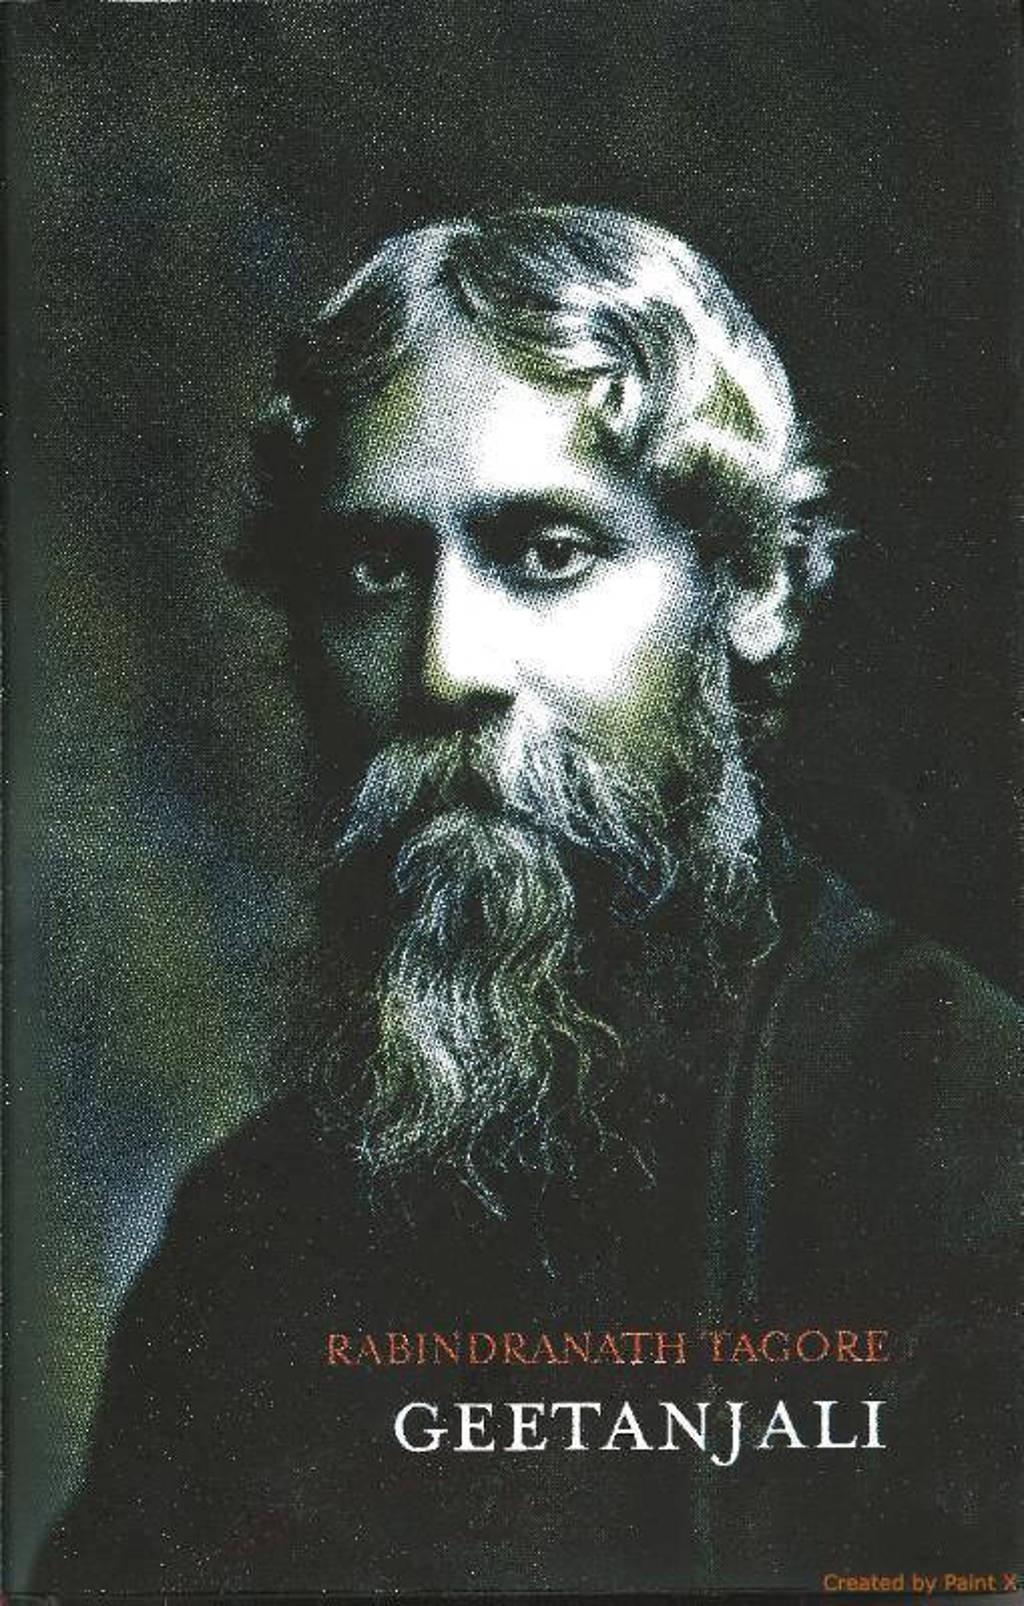 Gedichtenbundel: Geetanjali - Rabindranath Tagore